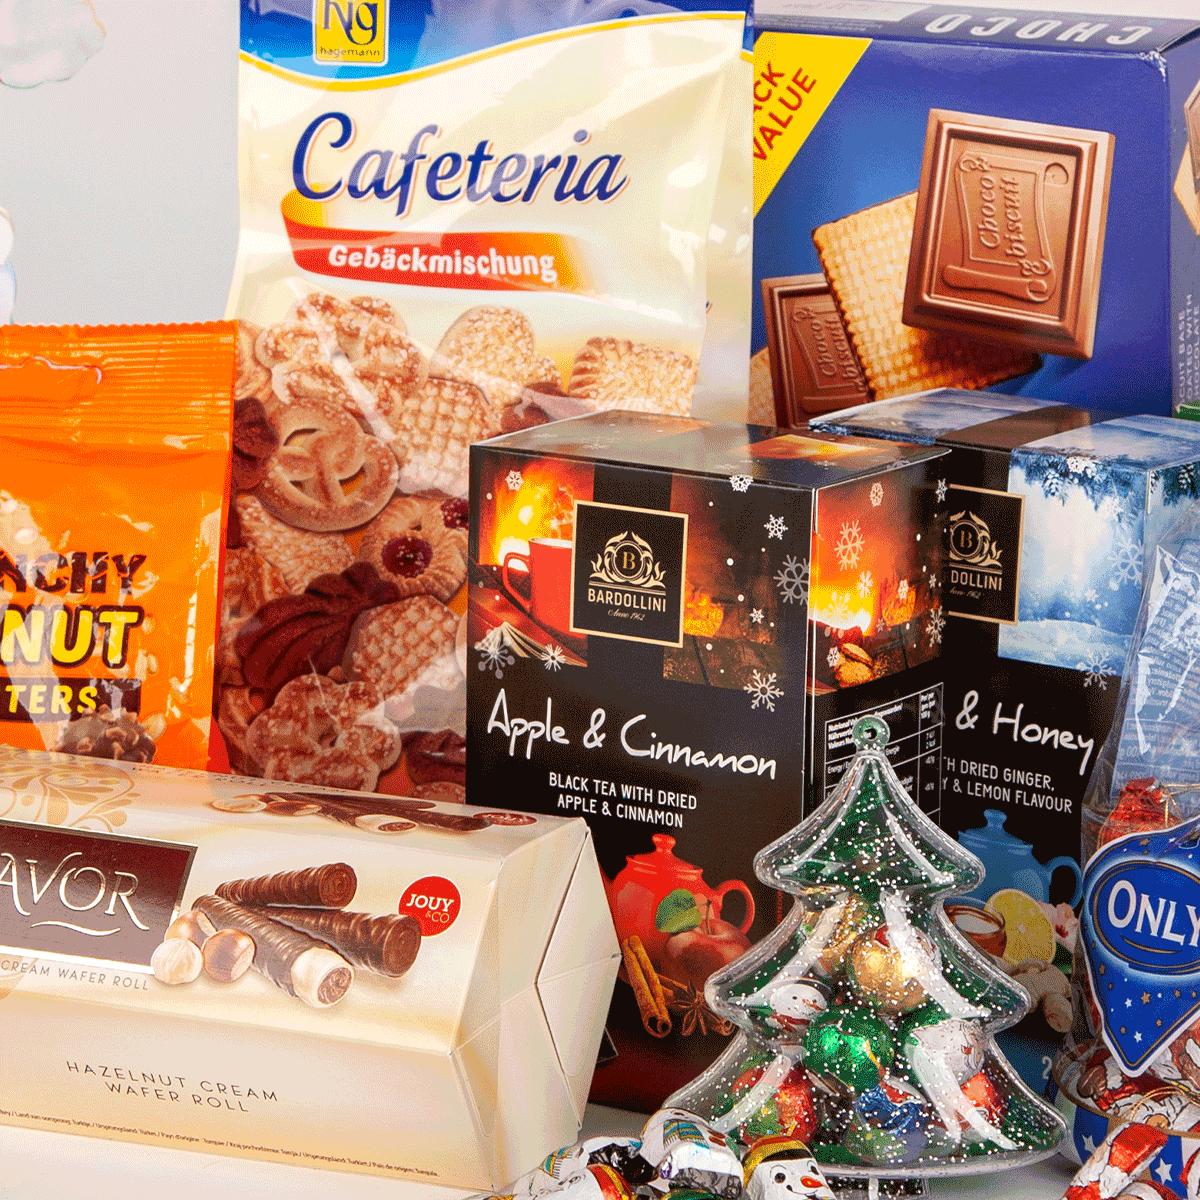 Süßes zur Adventszeit